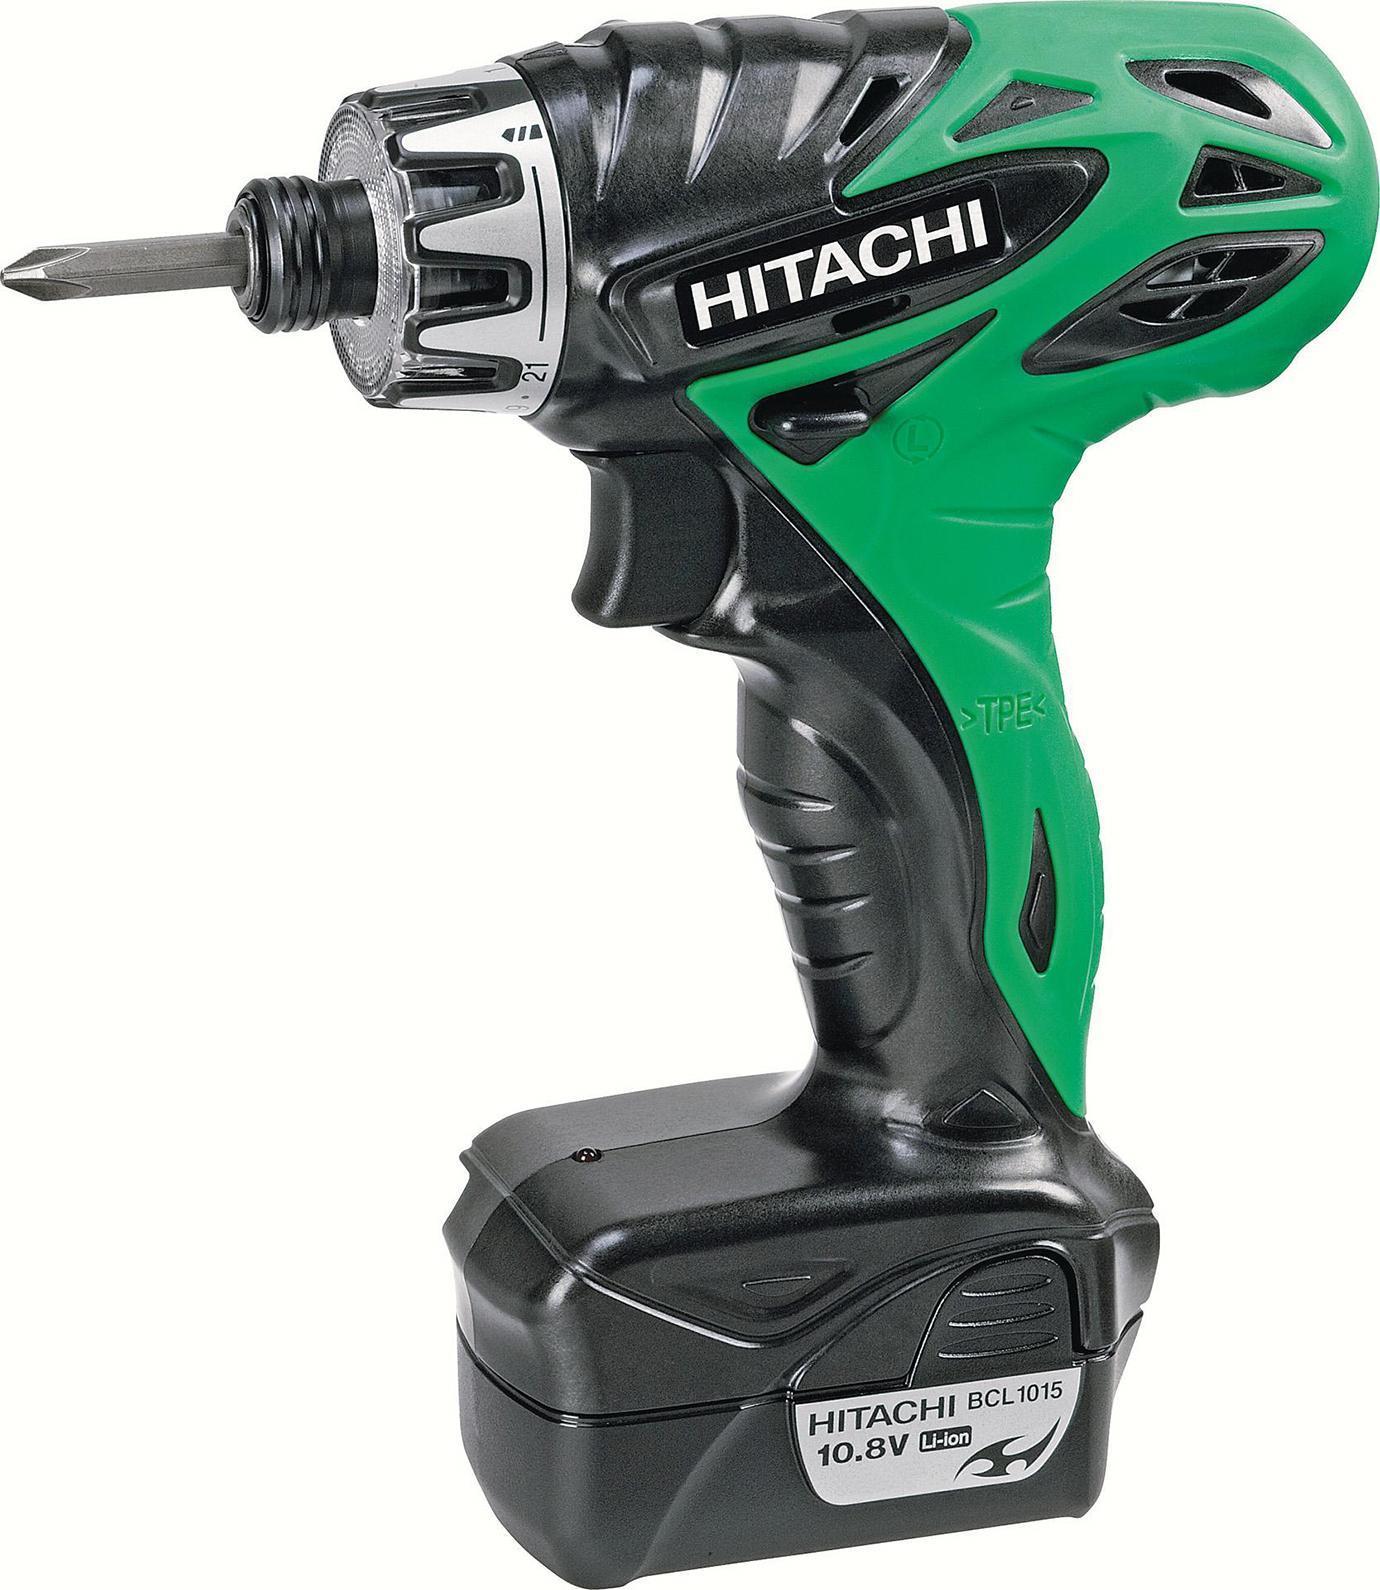 Hitachi DB10DL аккумуляторный шуруповертDB10DL